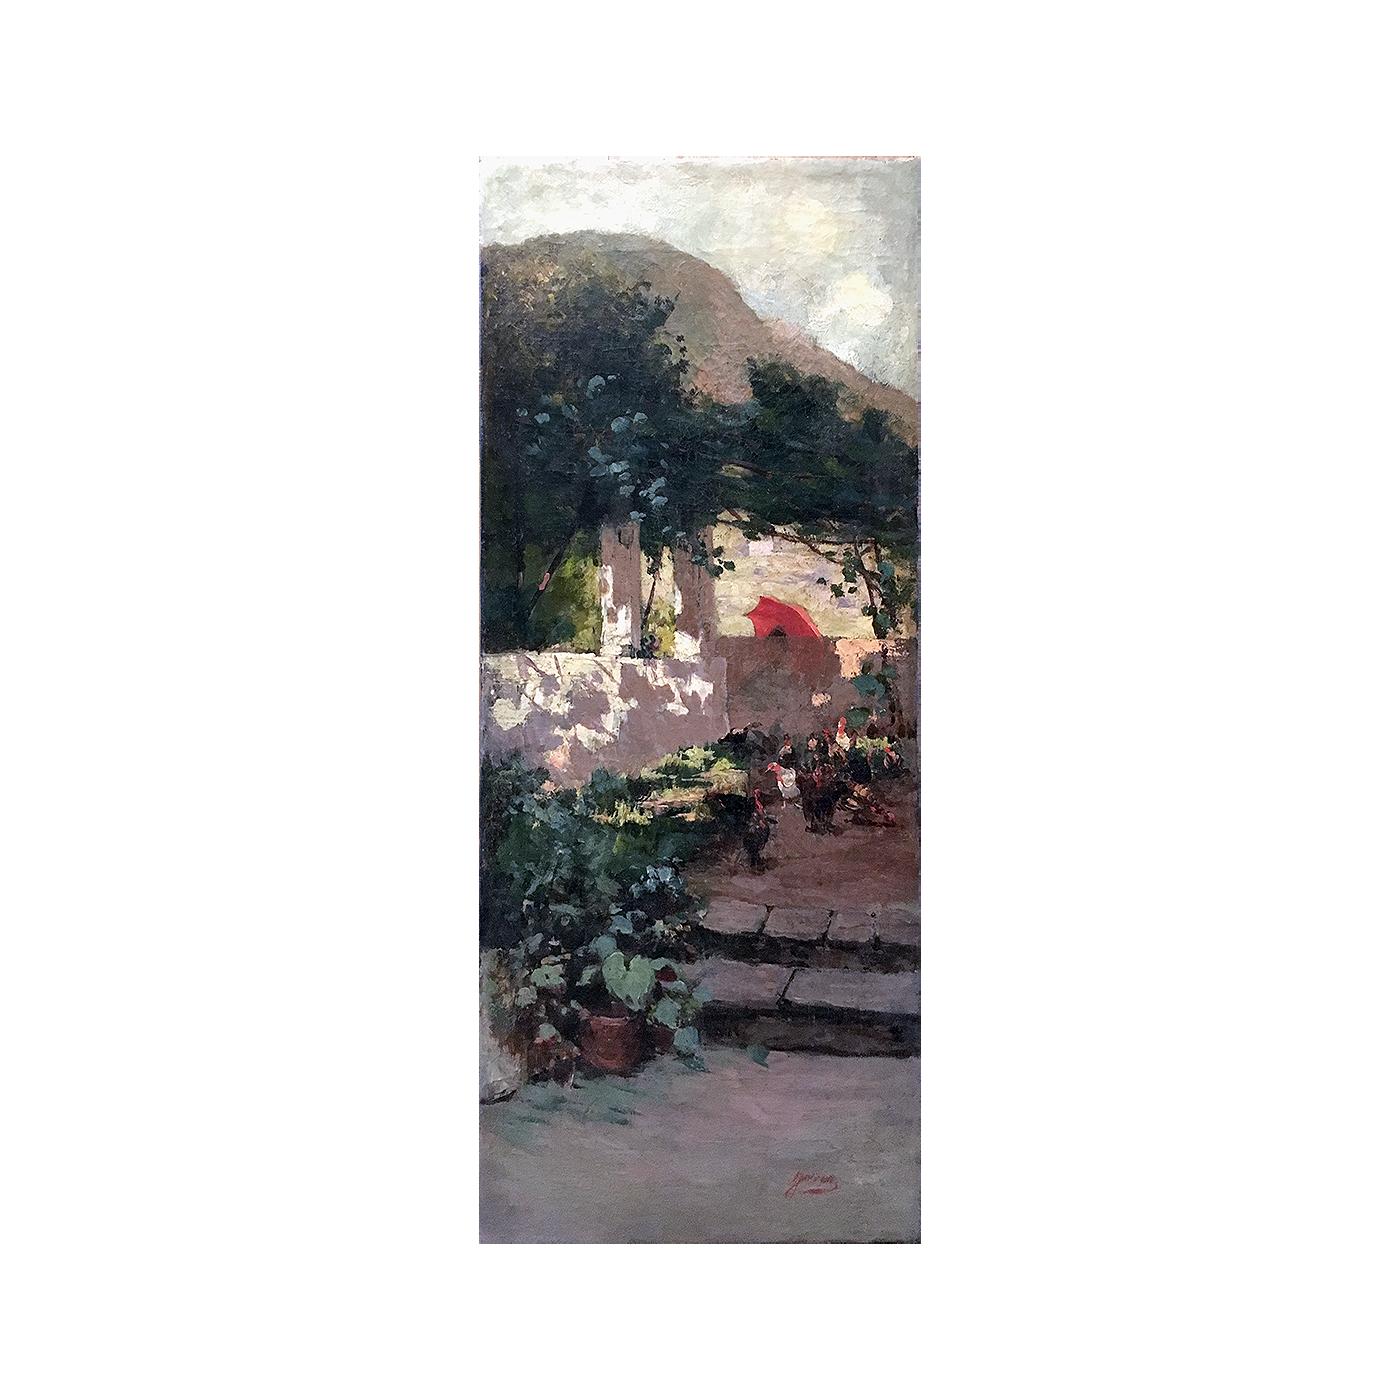 "Francisco Jover Casanova  (1836 – 1890)  Spanish Painter ""The Red Umbrella""  circa 1870"